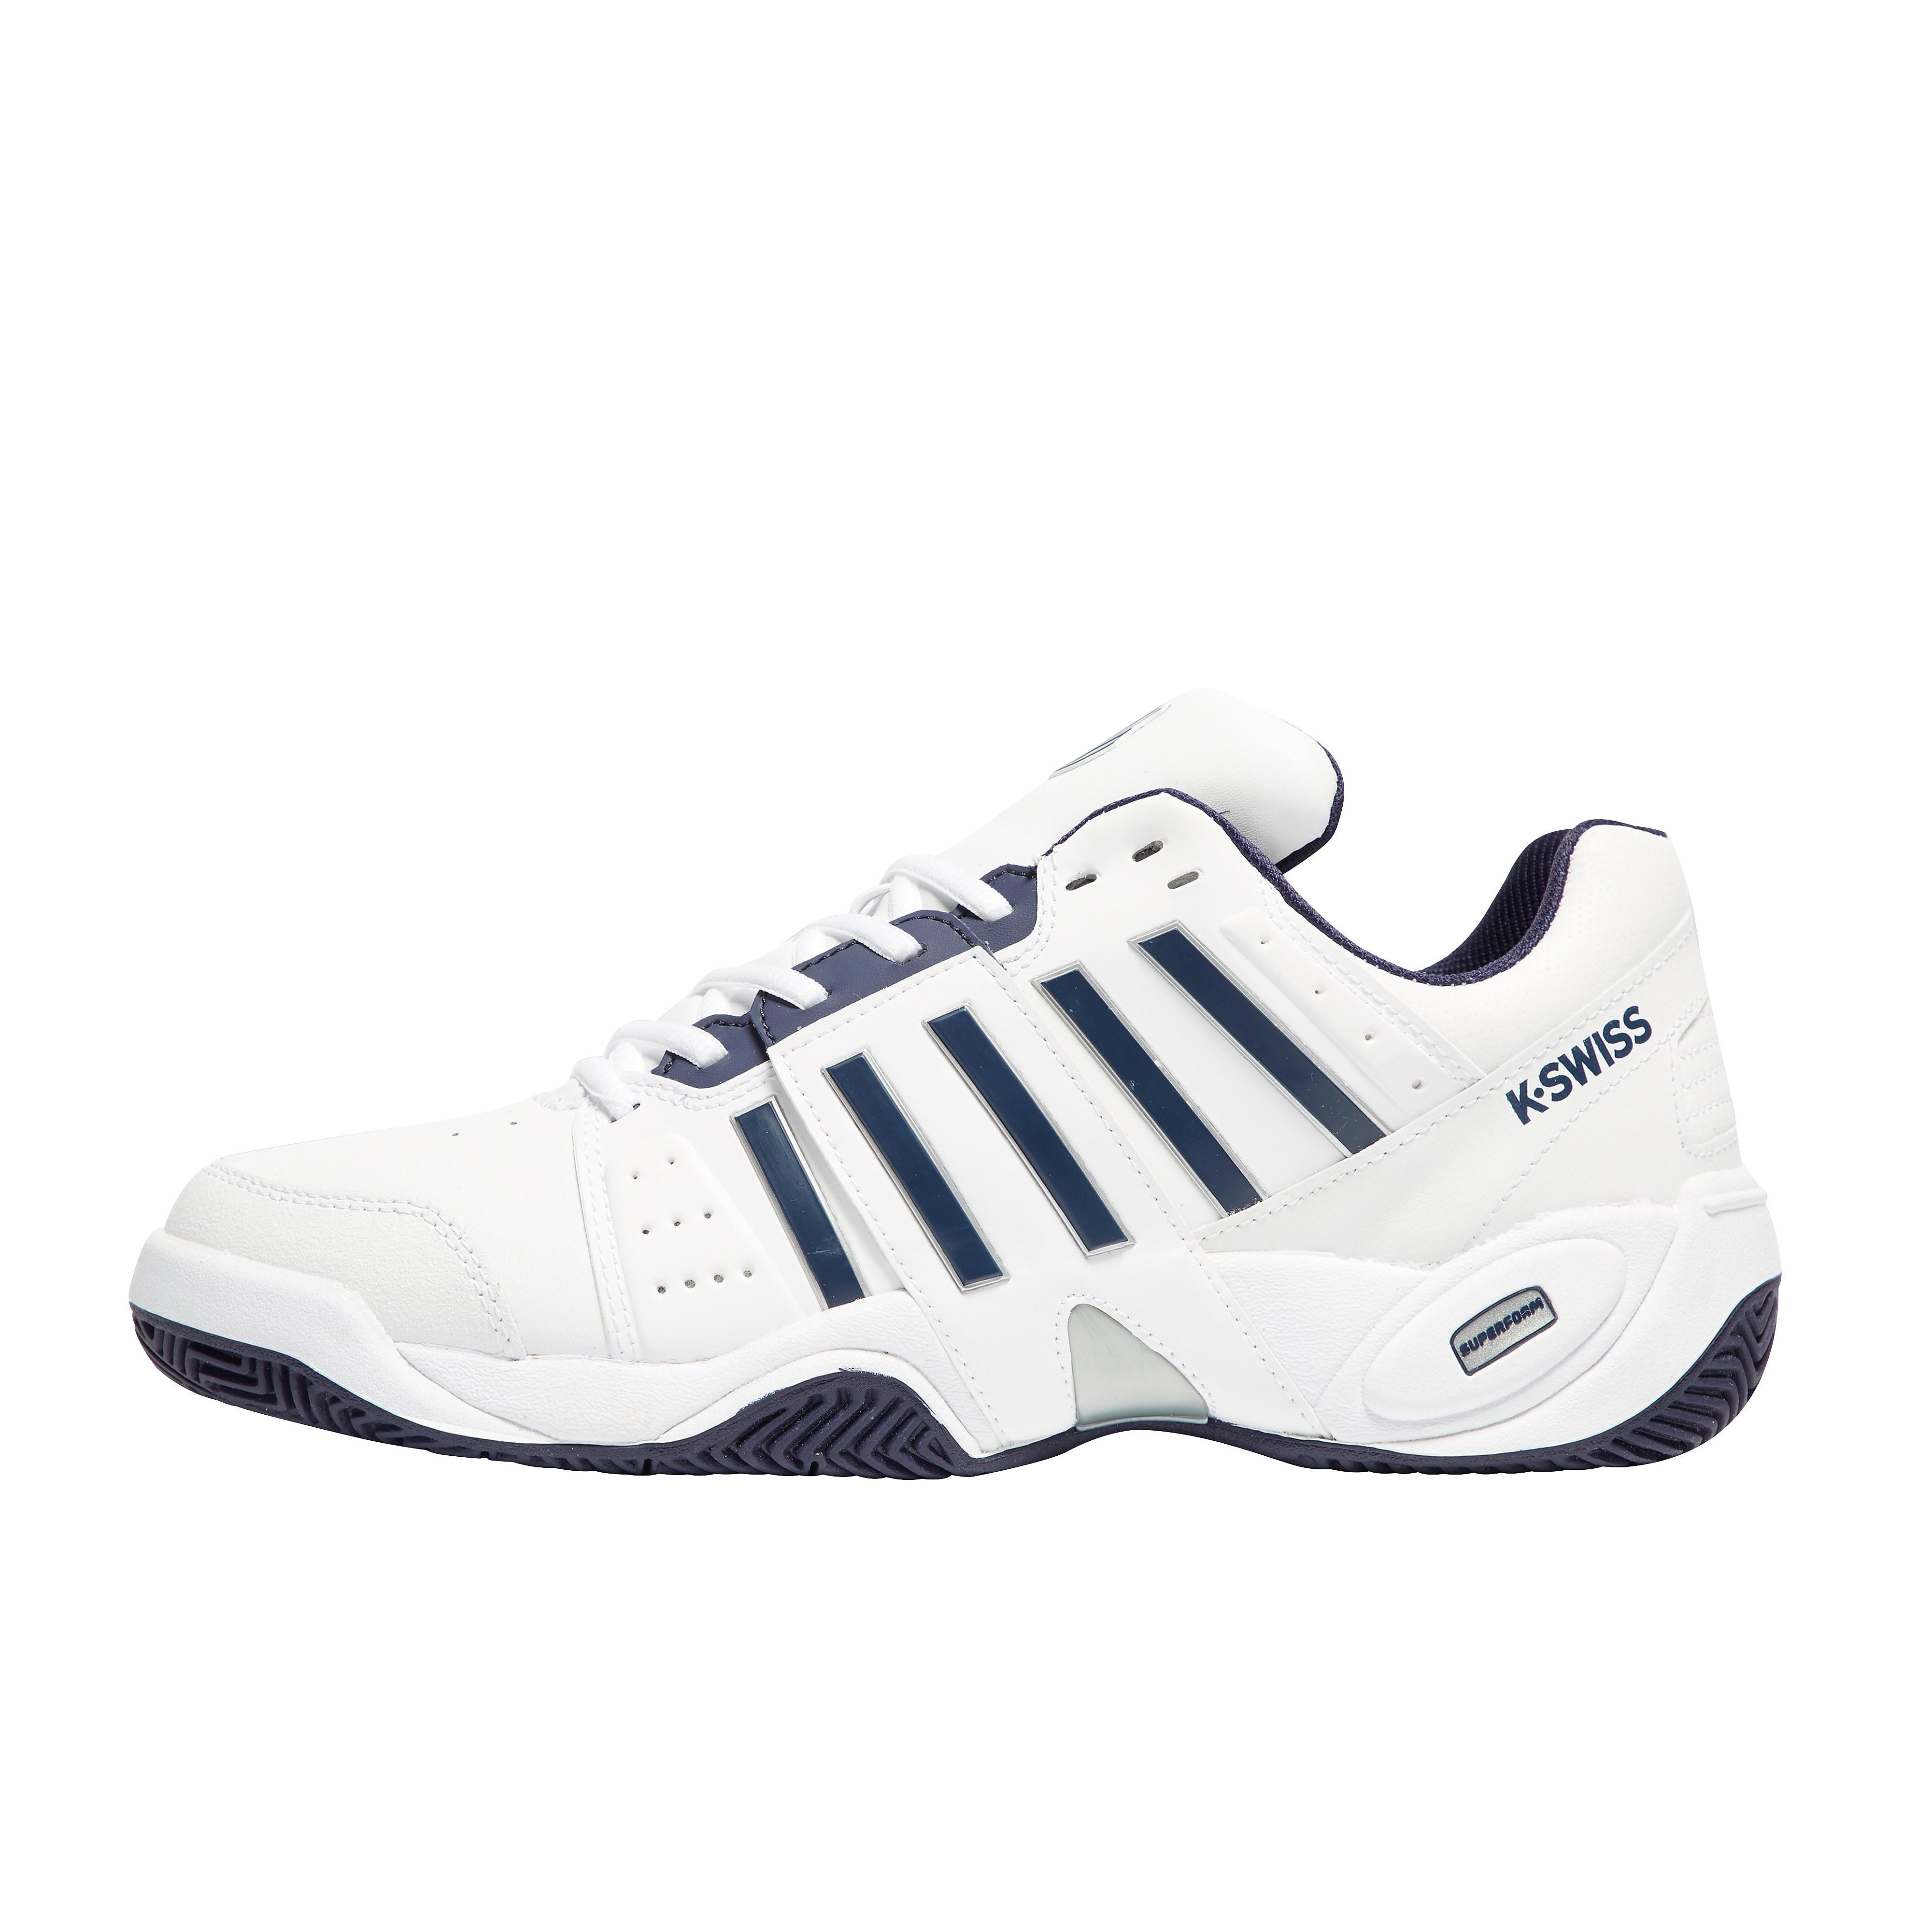 K-Swiss Accomplish III Men's Tennis Shoes